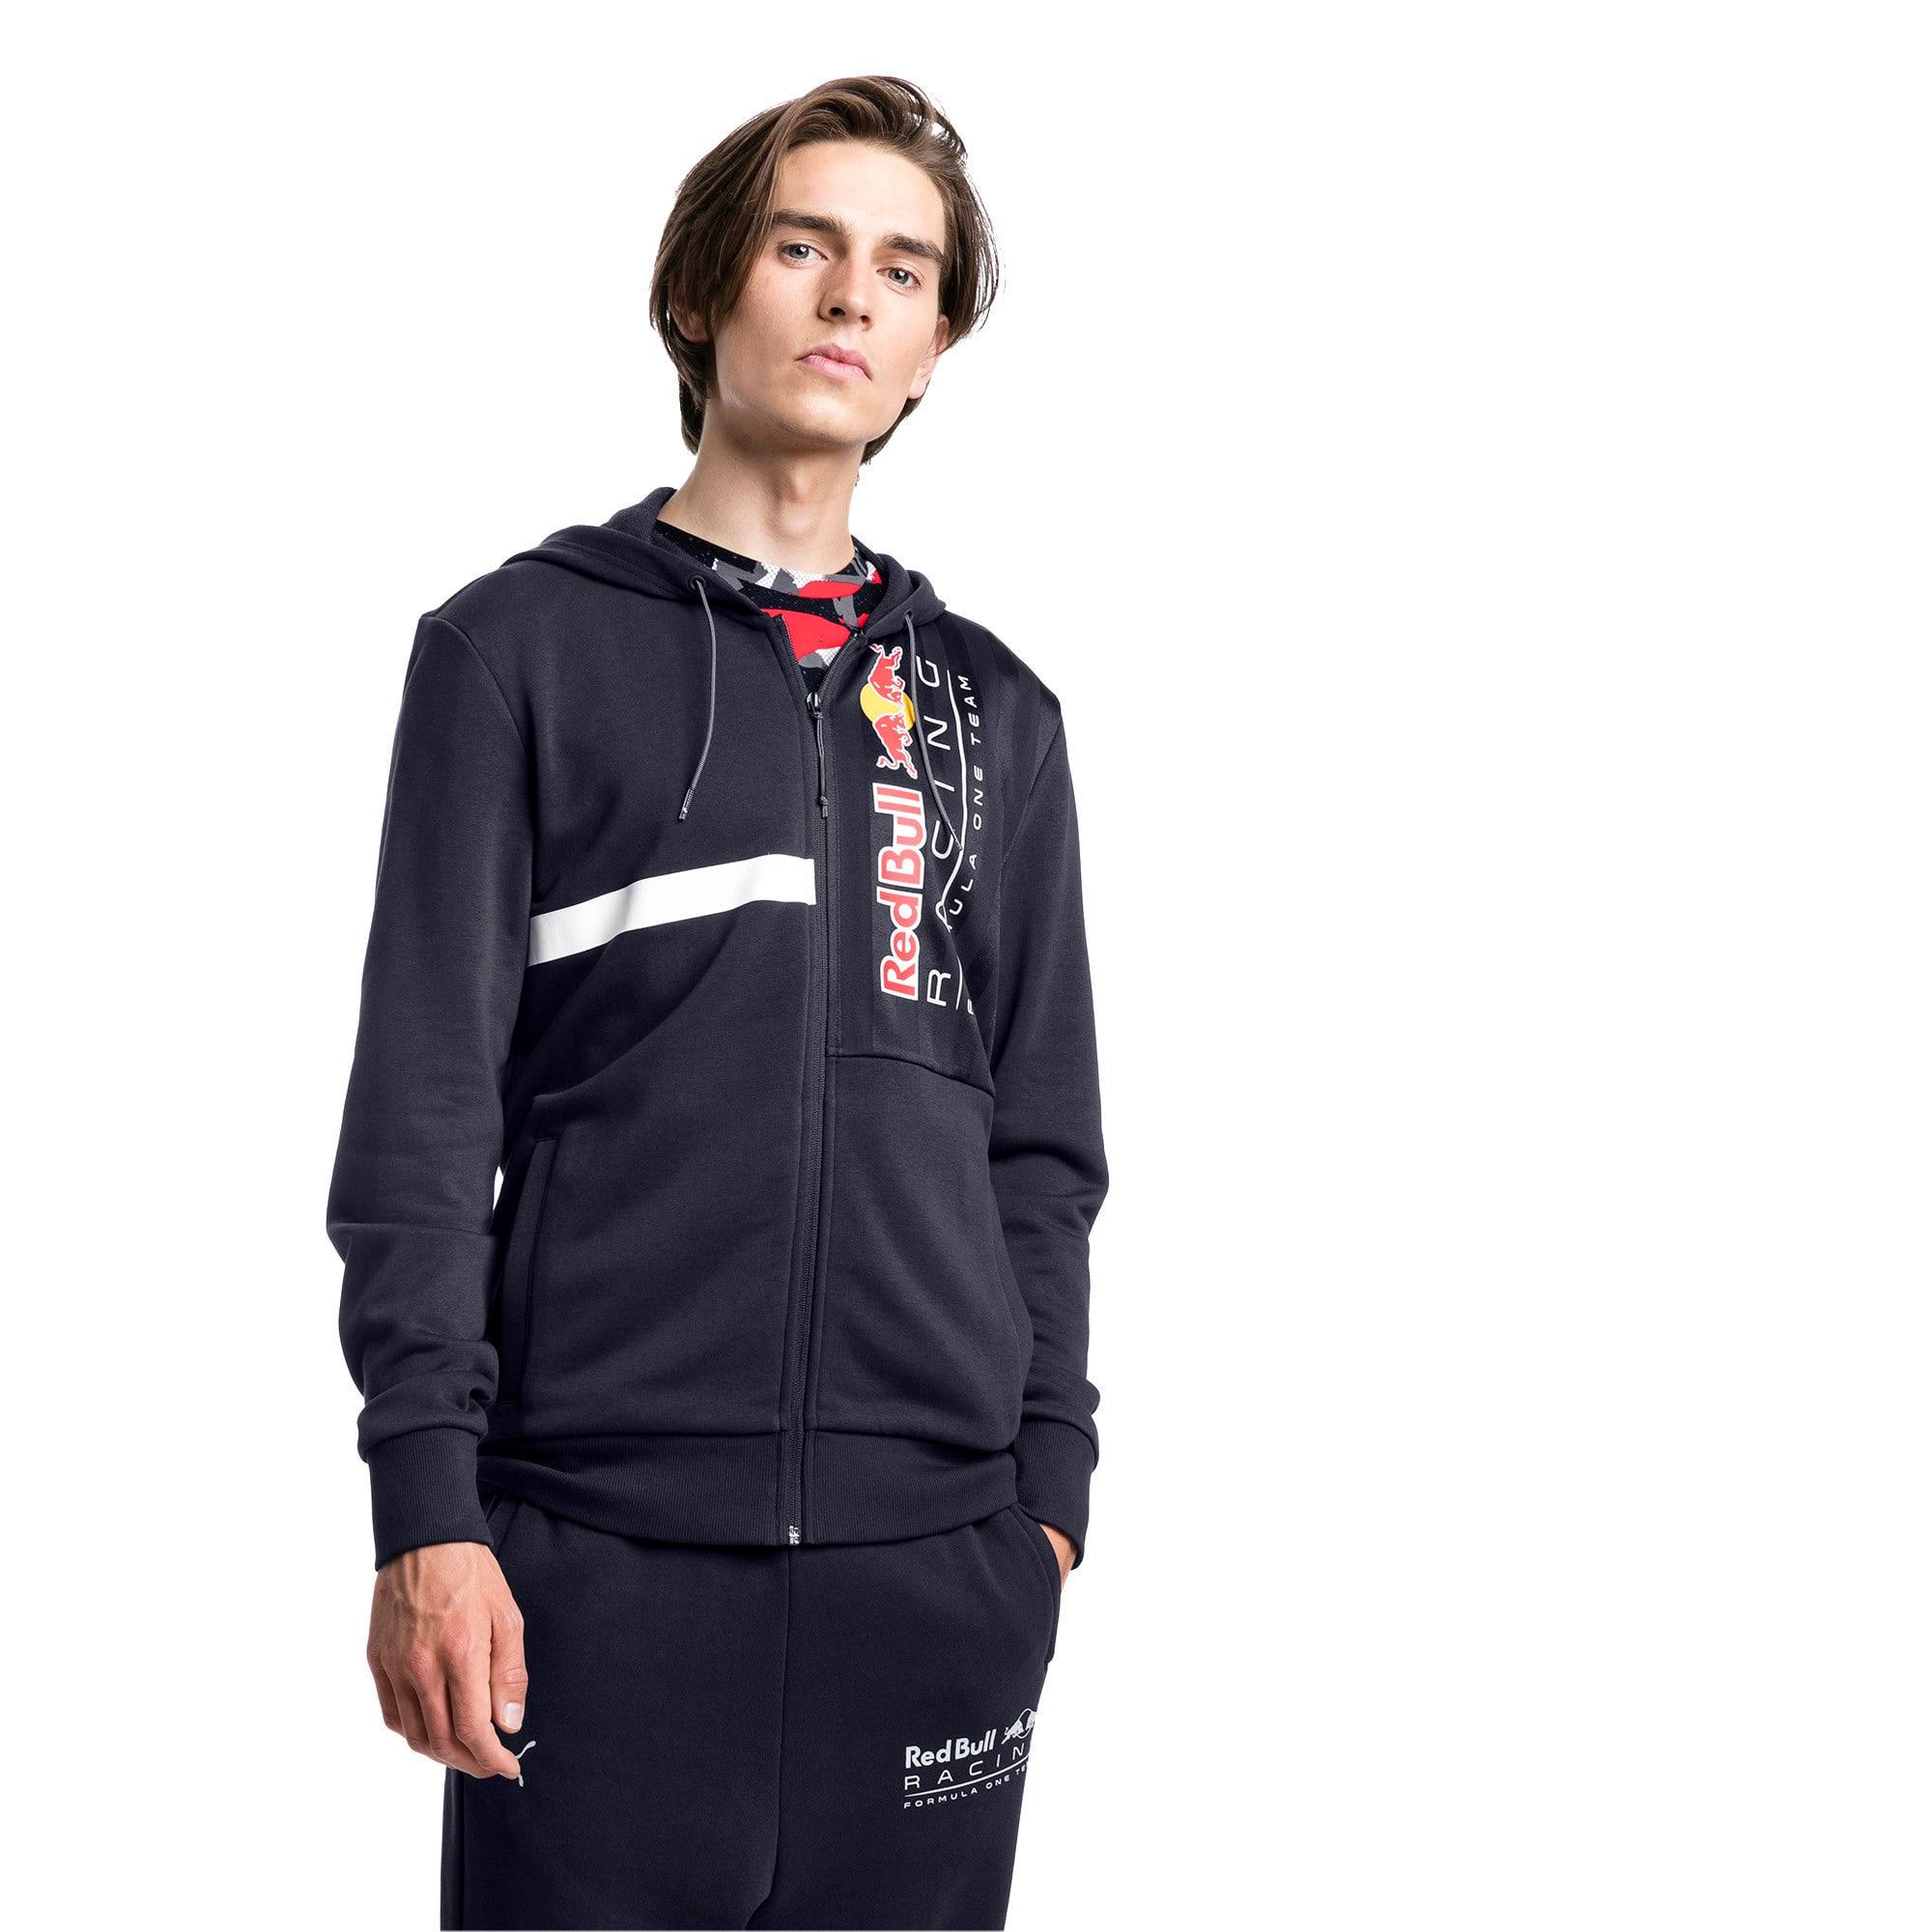 Thumbnail 1 of Red Bull Racing Hooded Men's Sweat Jacket, NIGHT SKY, medium-IND